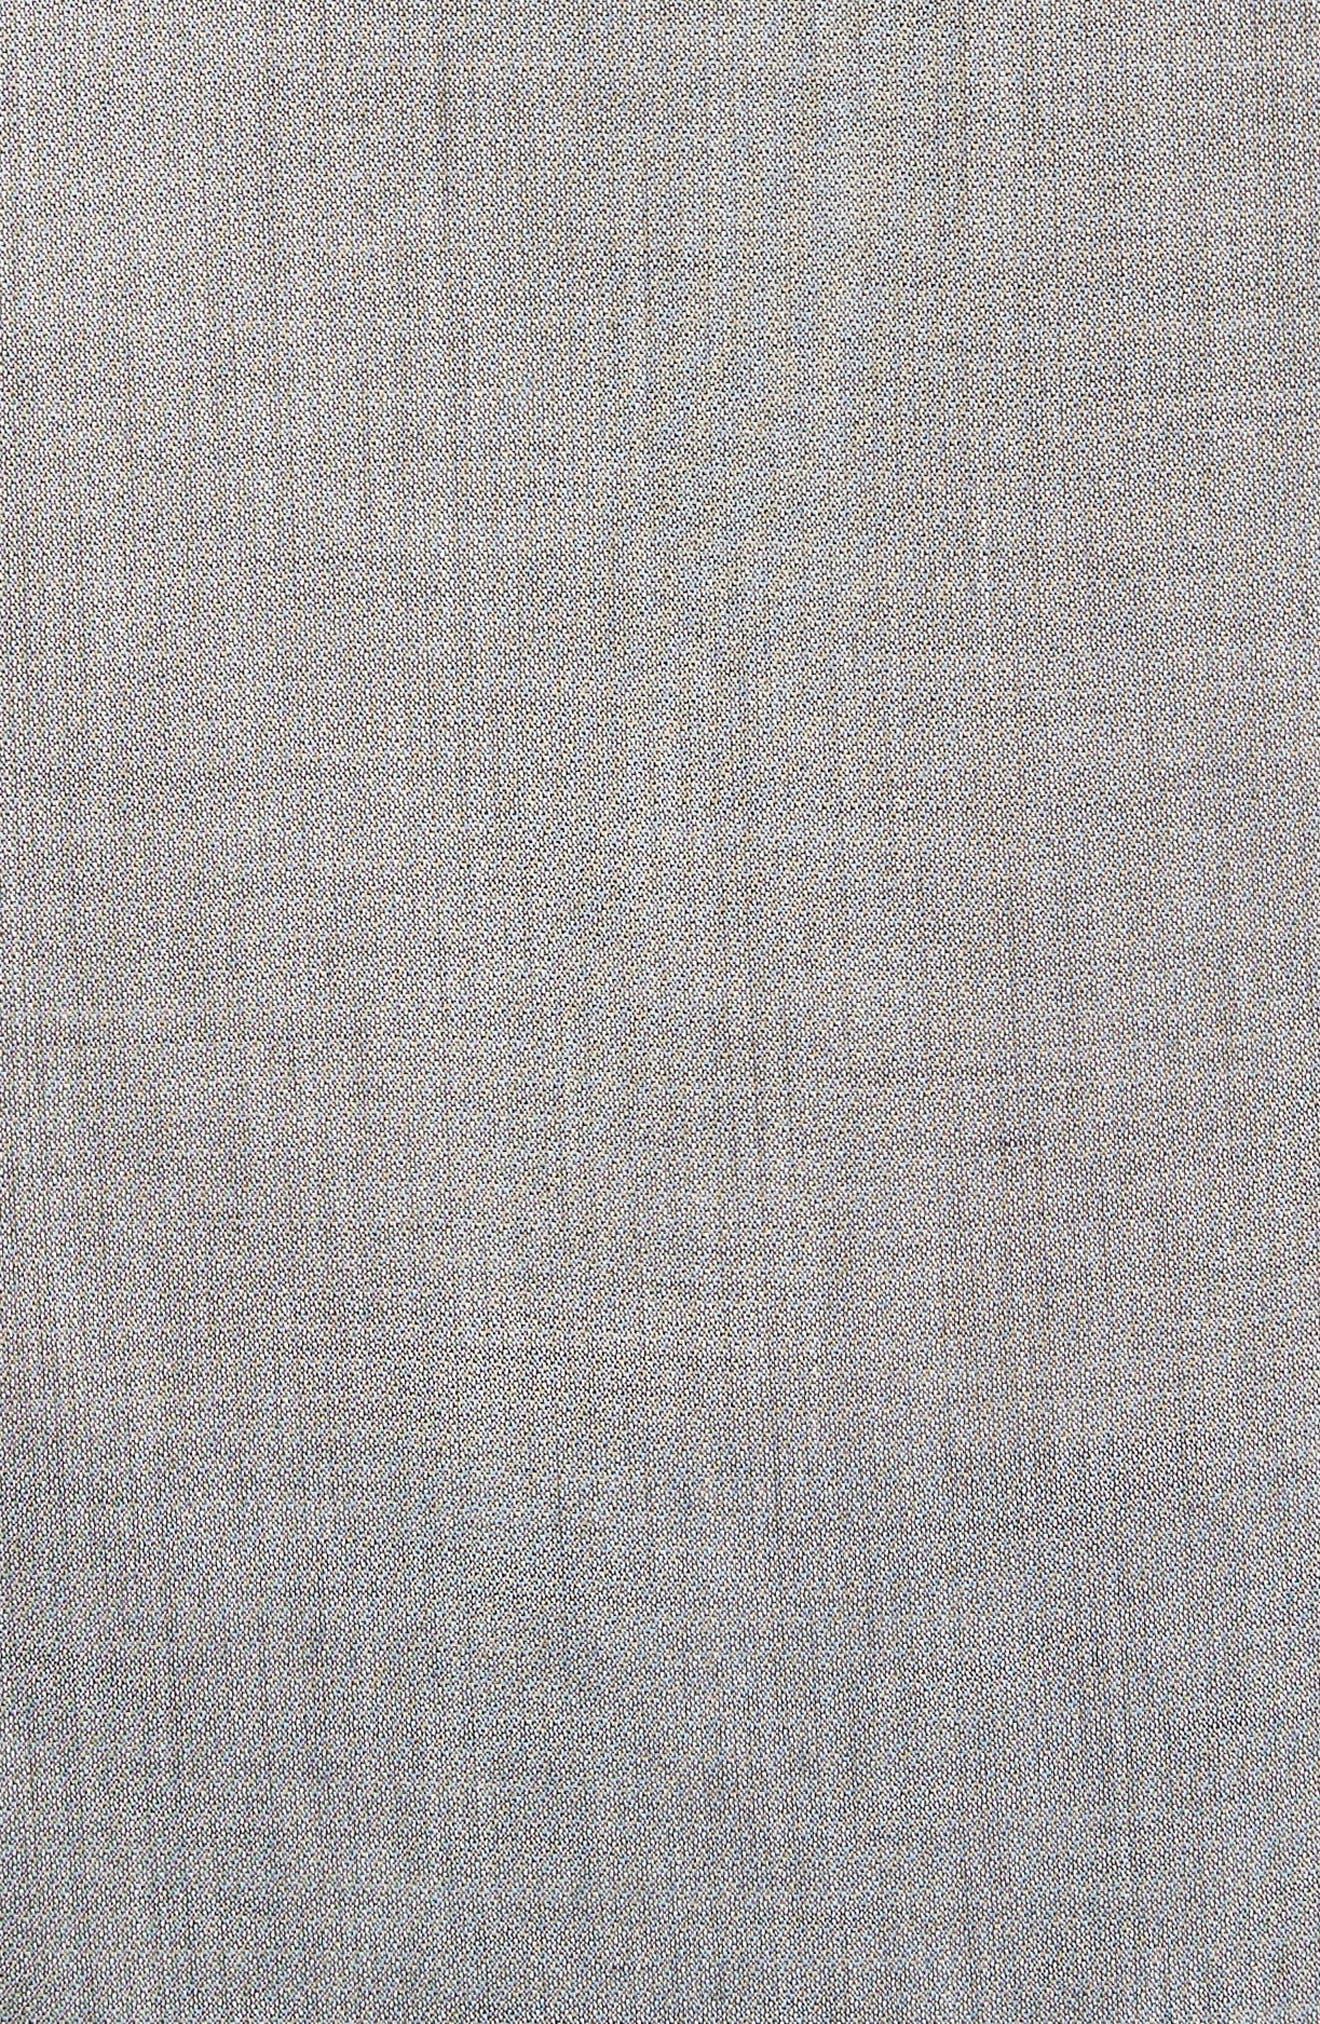 Slim Fit Roller Long Sleeve Shirt,                             Alternate thumbnail 5, color,                             057